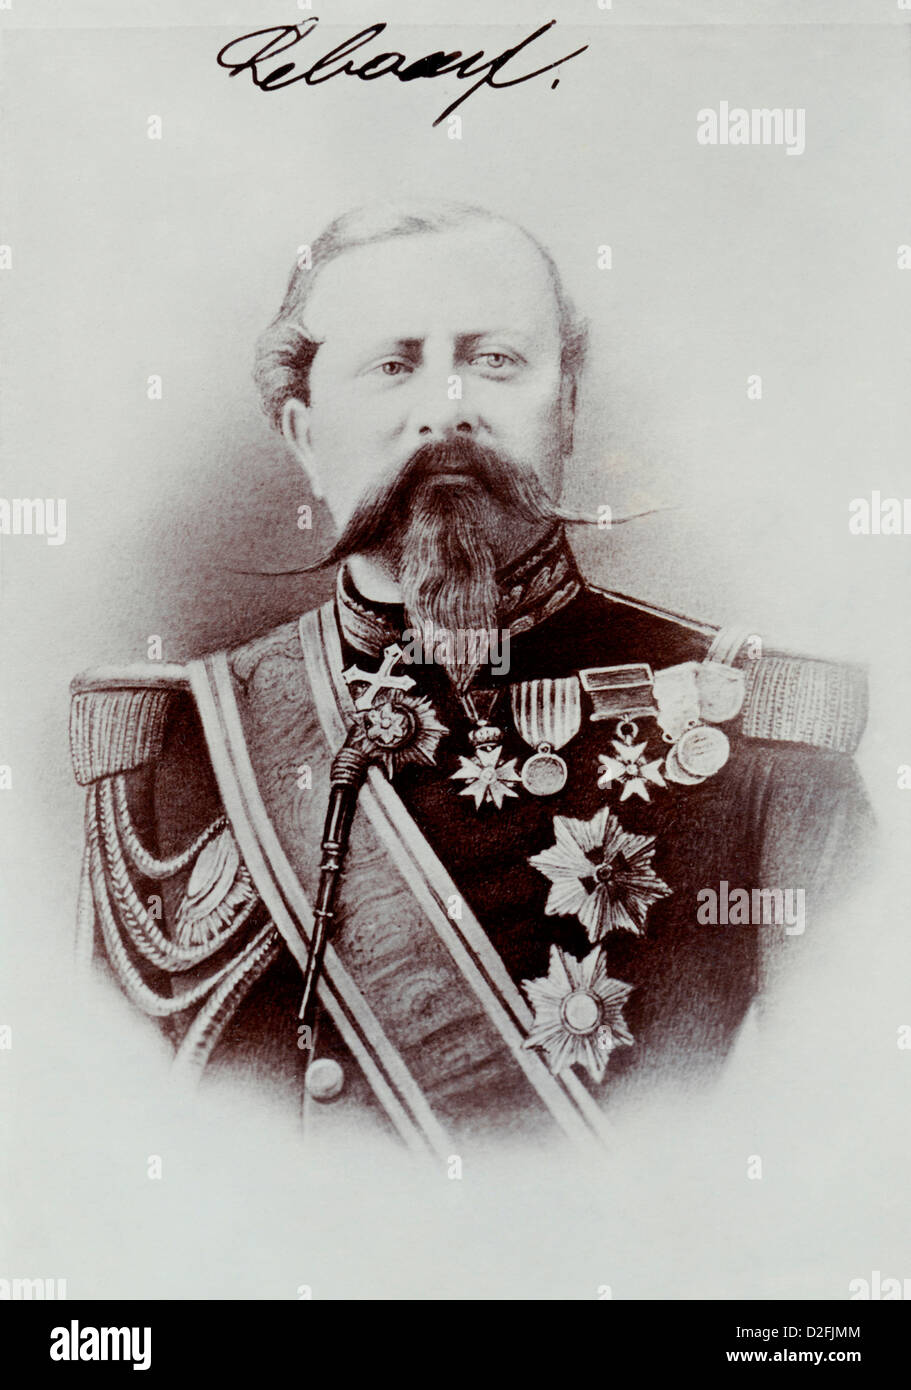 Edmond Leboeuf, 1809-1888, marshal of France and Minister of War, Franco-Prussian War or Franco-German War 1870 - Stock Image